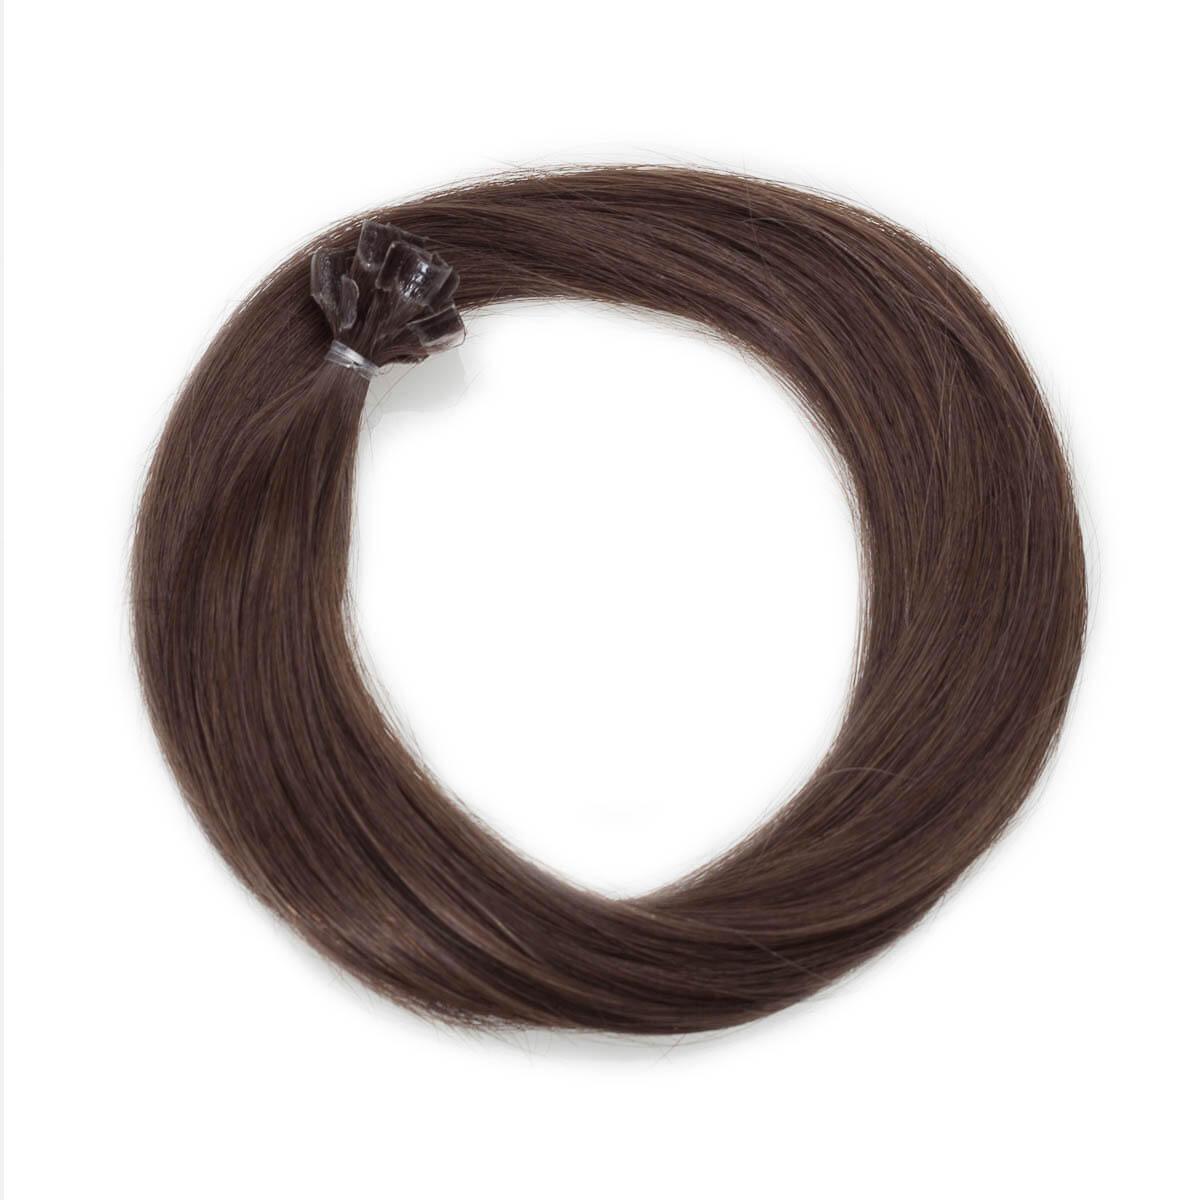 Nail Hair Original 2.6 Dark Ash Brown 40 cm